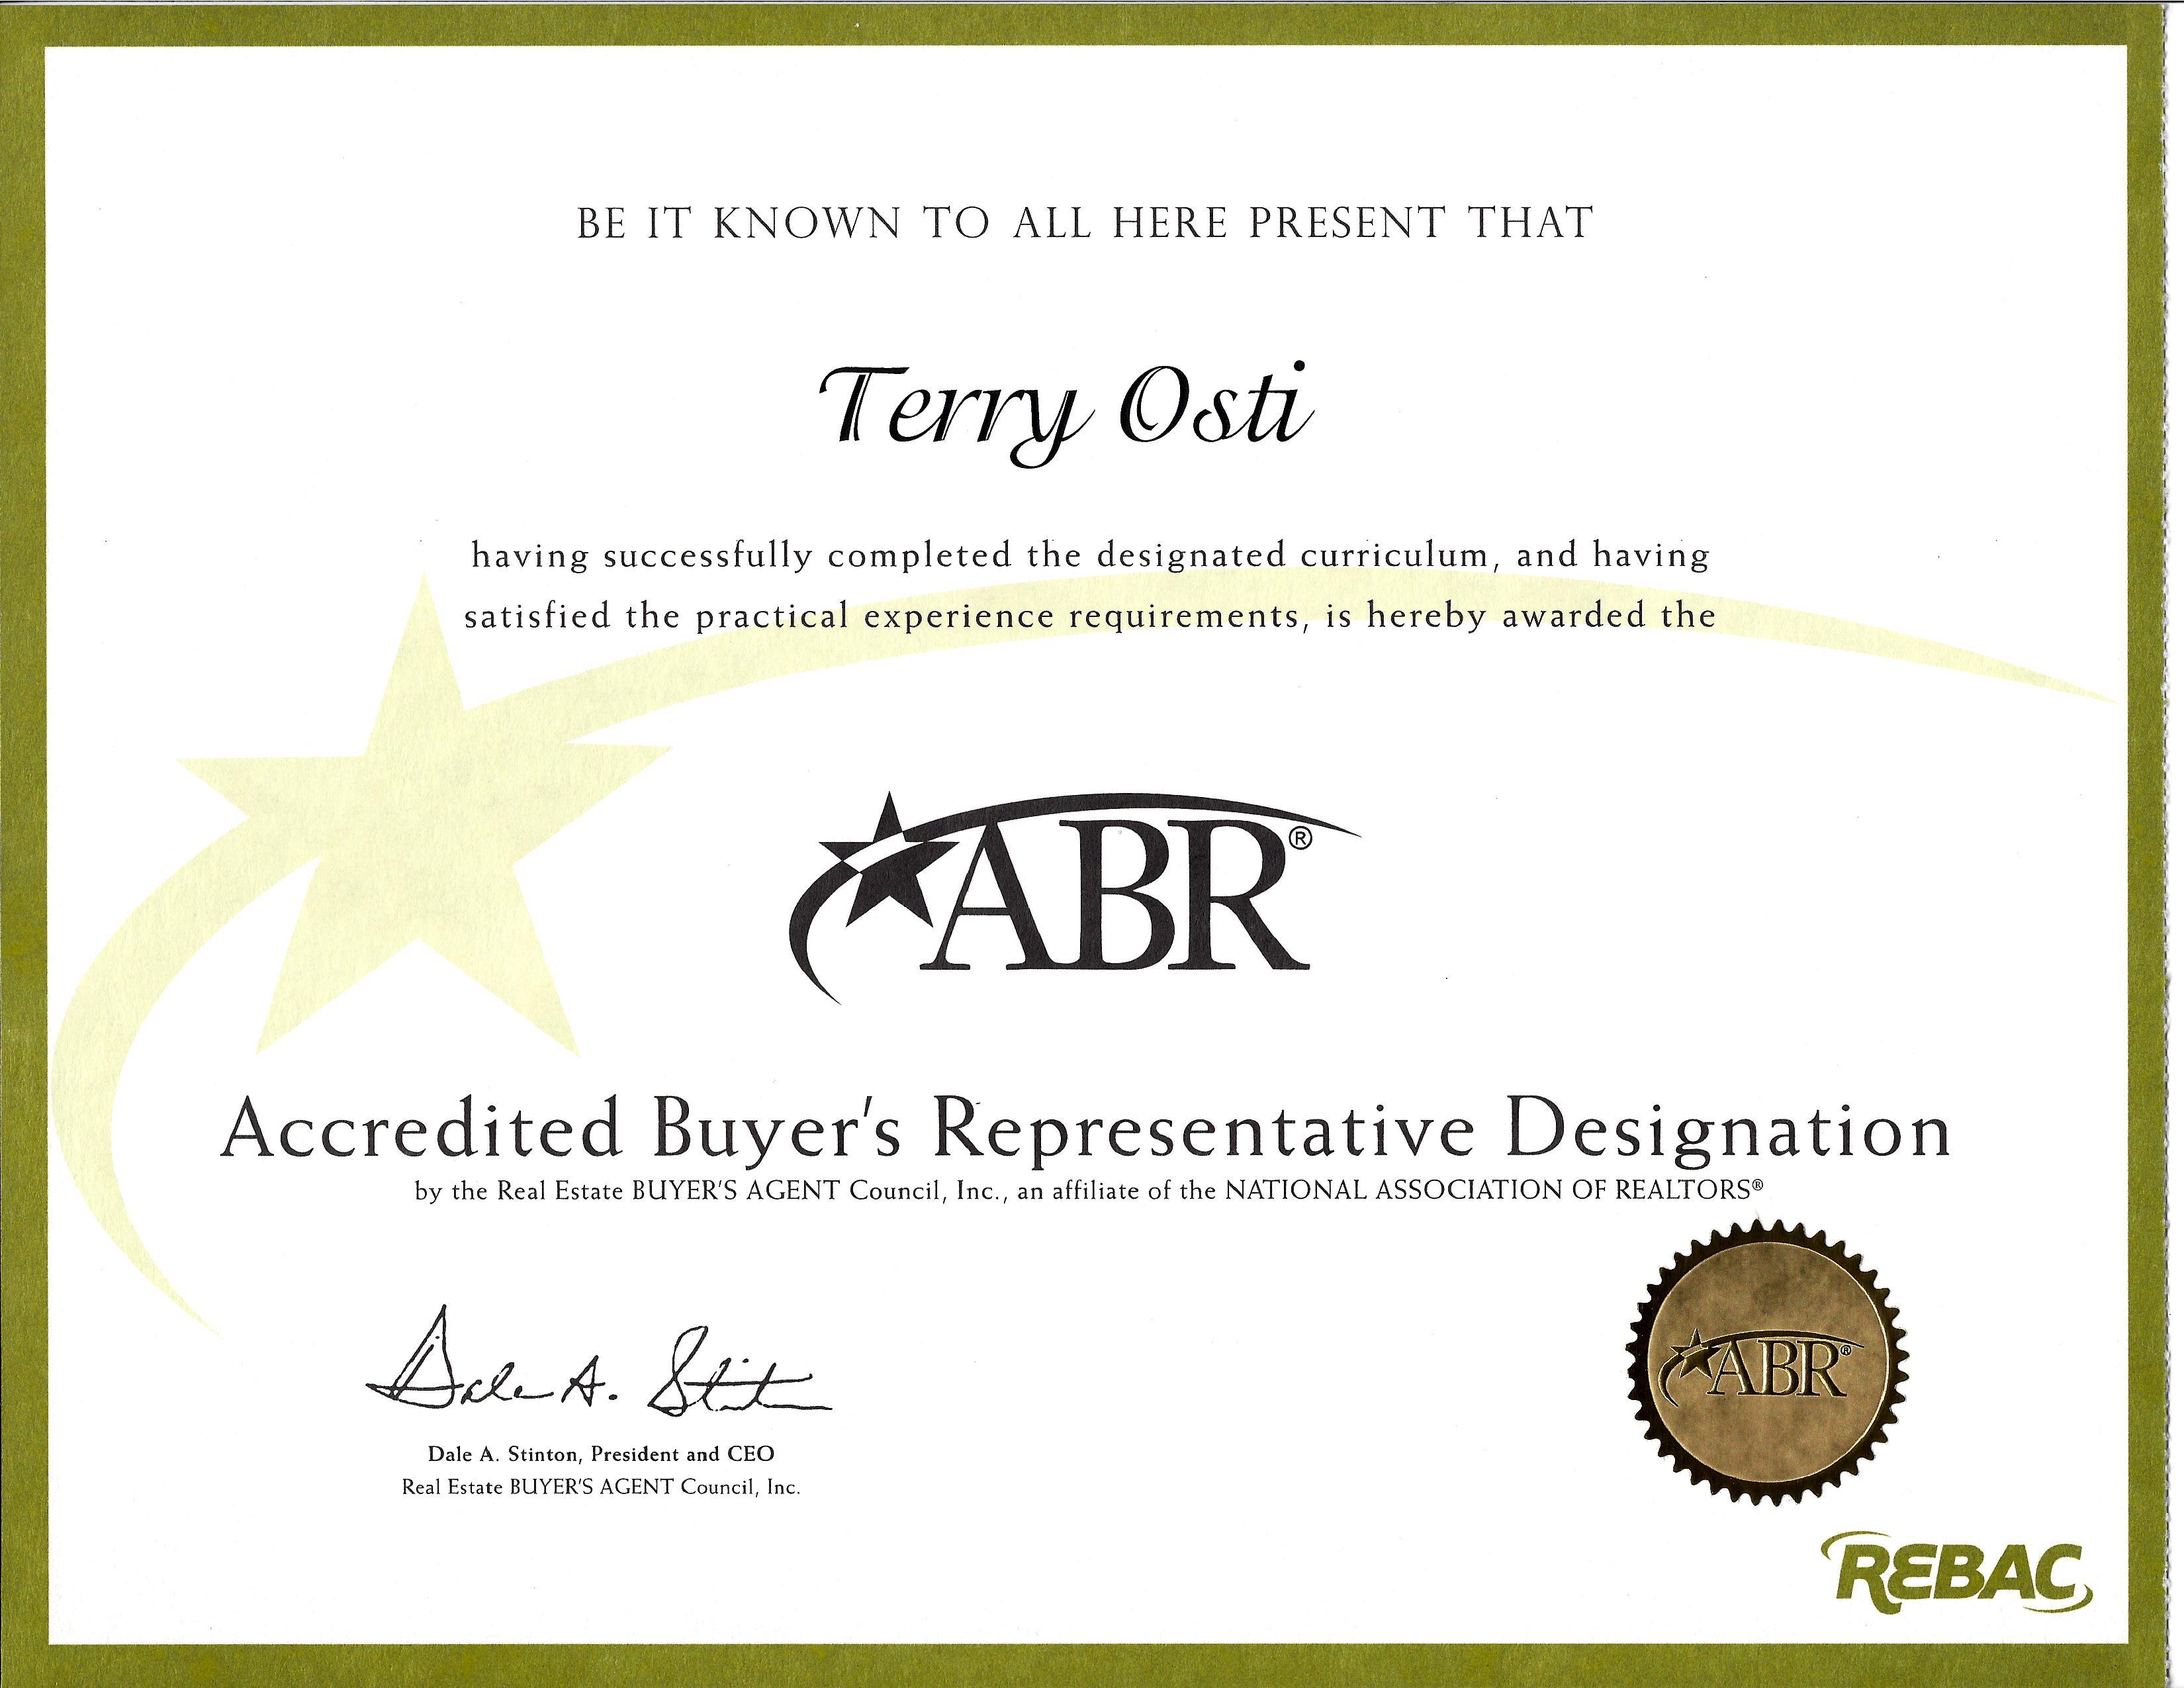 Accredited Buyers Representative  image